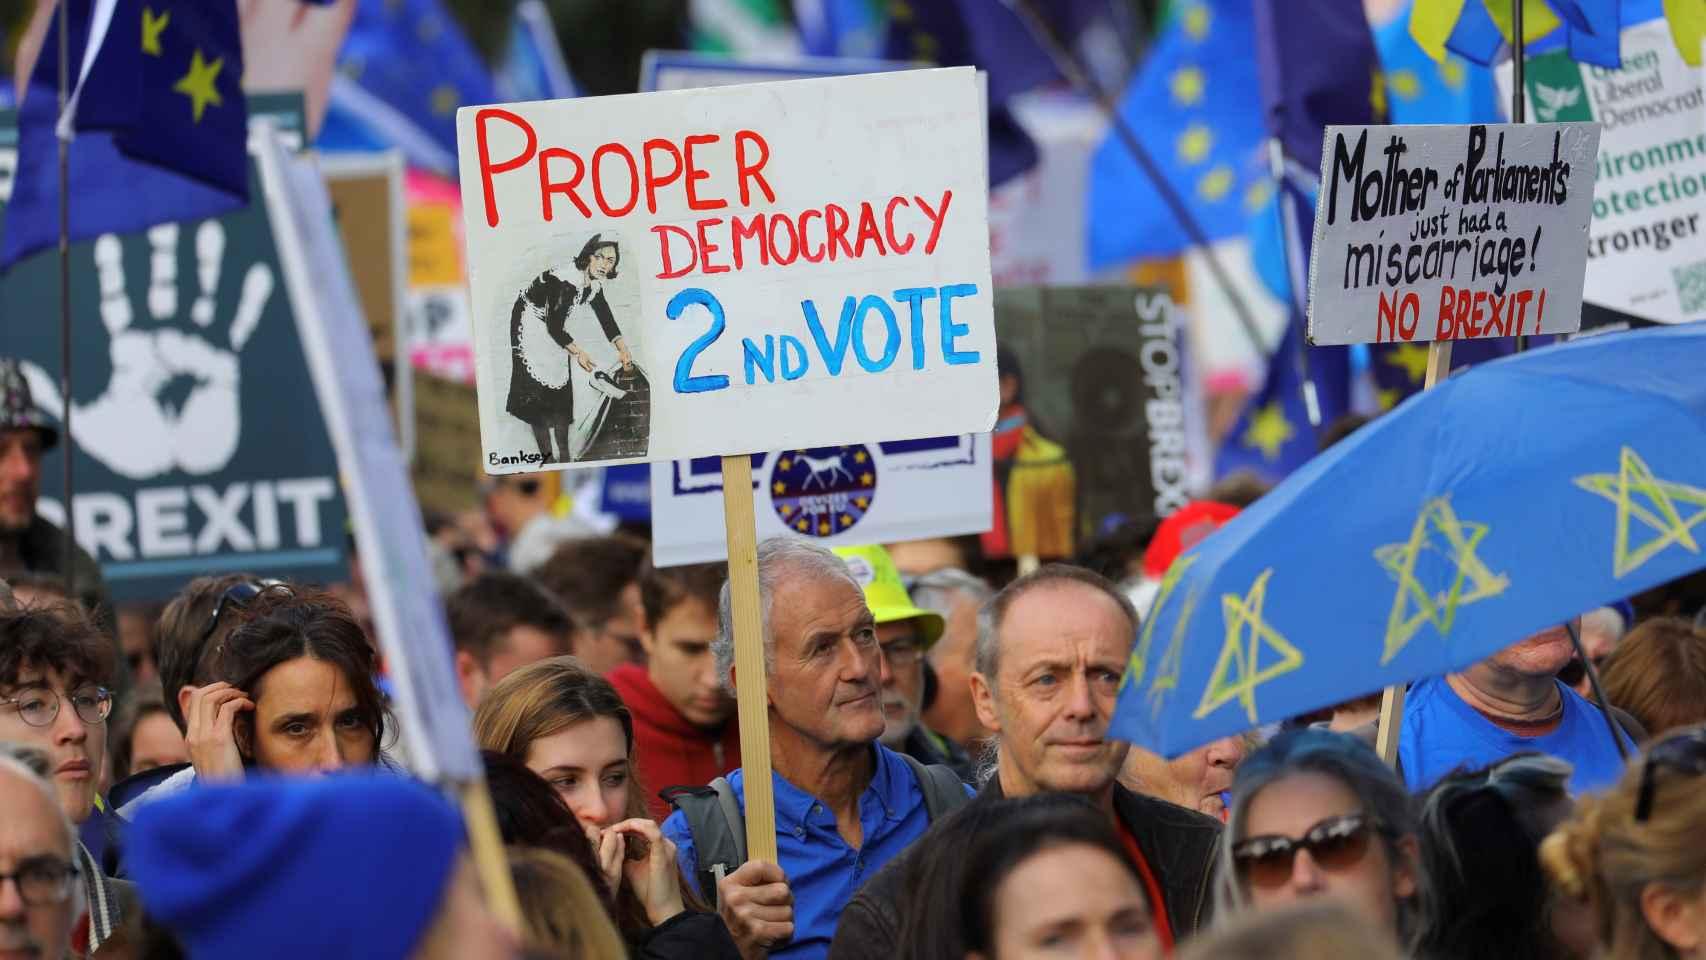 Opositores al 'brexit' piden un segundo referéndum antes de que se ejecute.